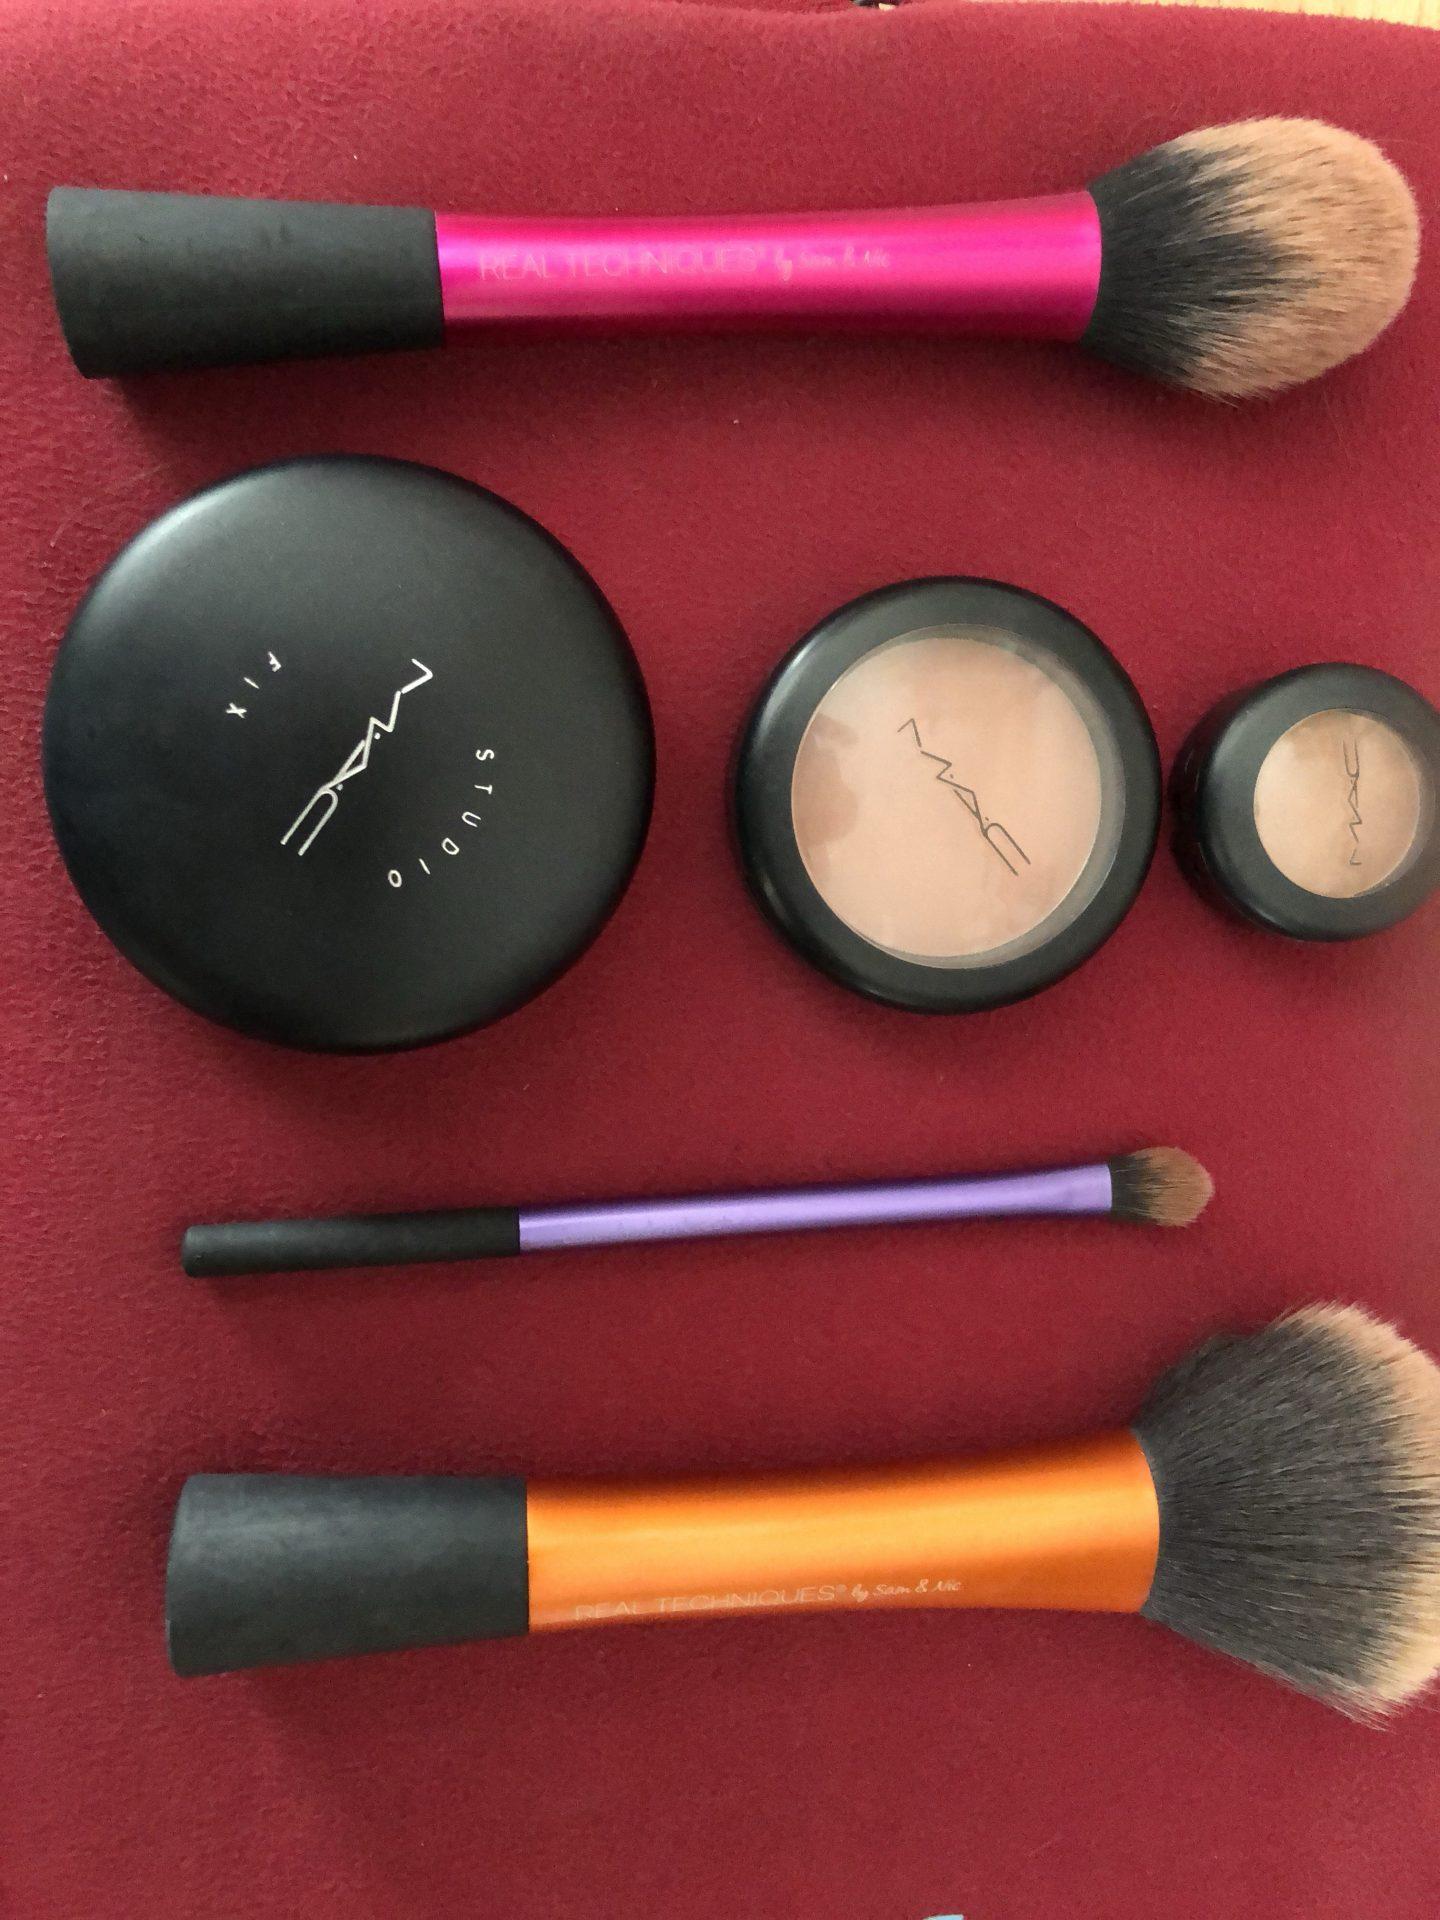 Make-up brushes, powder, blusher and eyeshadow